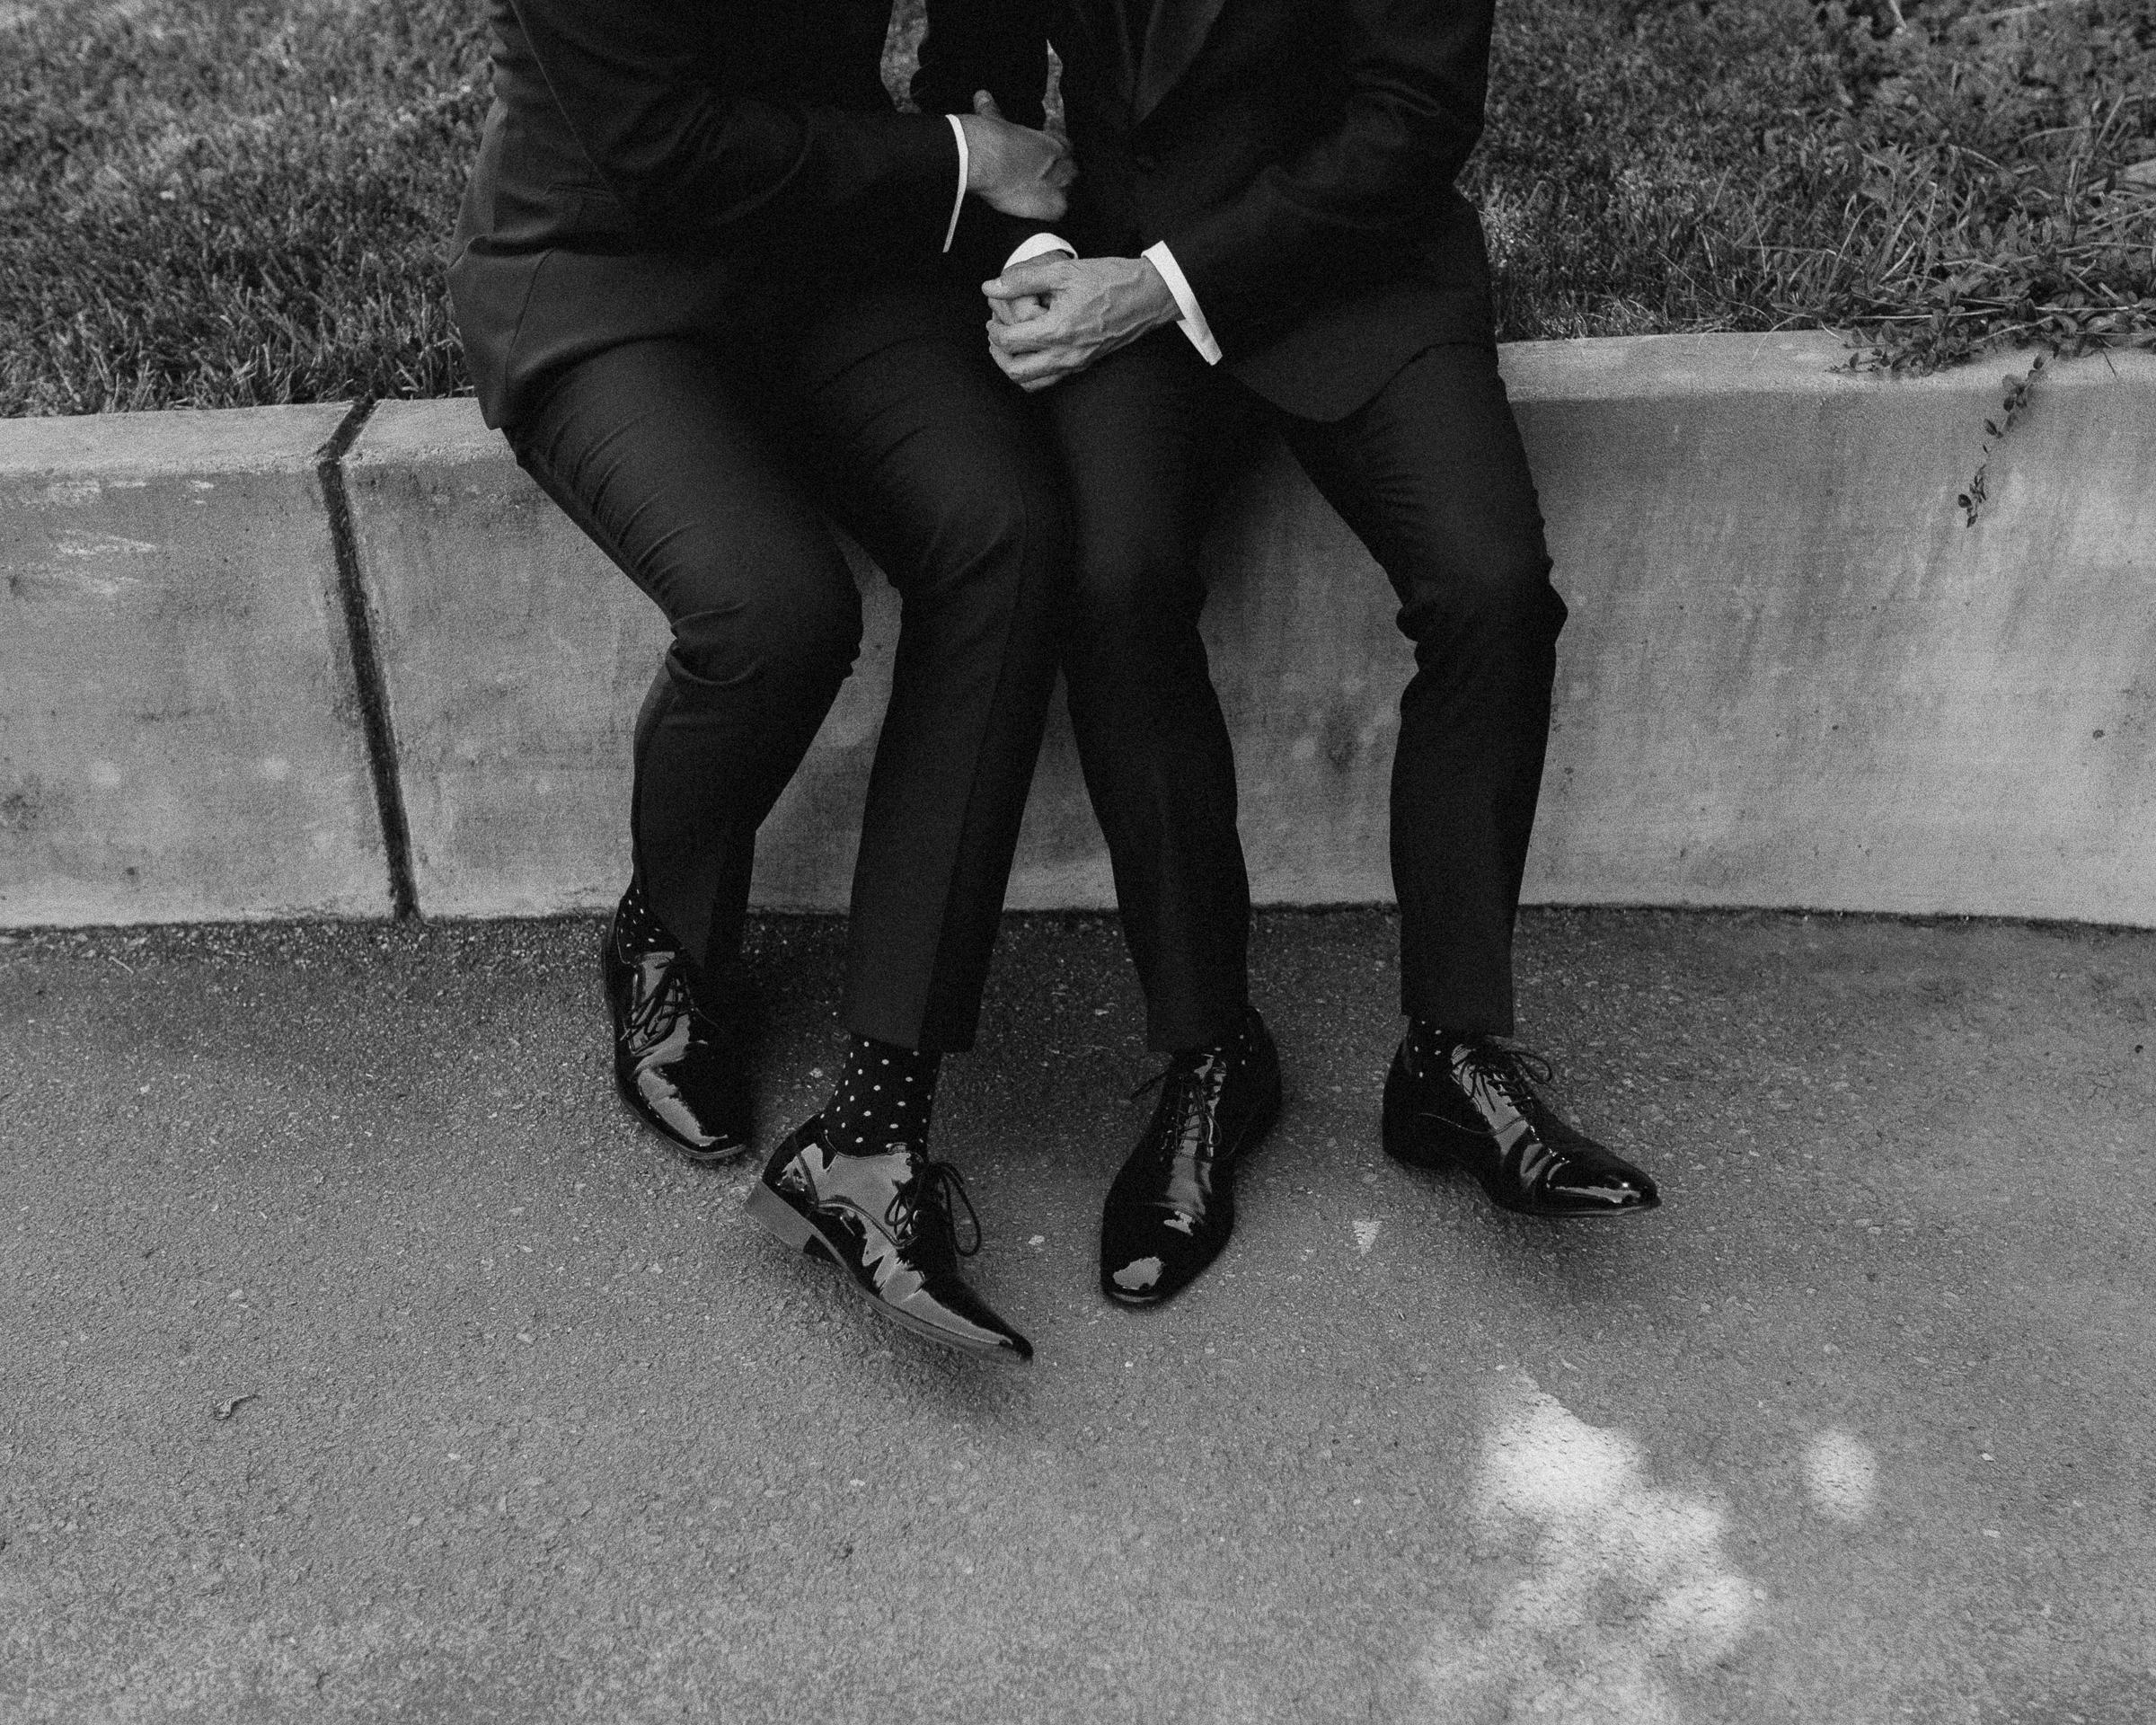 Intimate Sonoma County Wedding | Gretchen Gause Photography #theknotwedding #vintnersinnwedding #winerywedding #sfweddingphotographer #intimatewedding #gretchengausephotography #equaldiginity